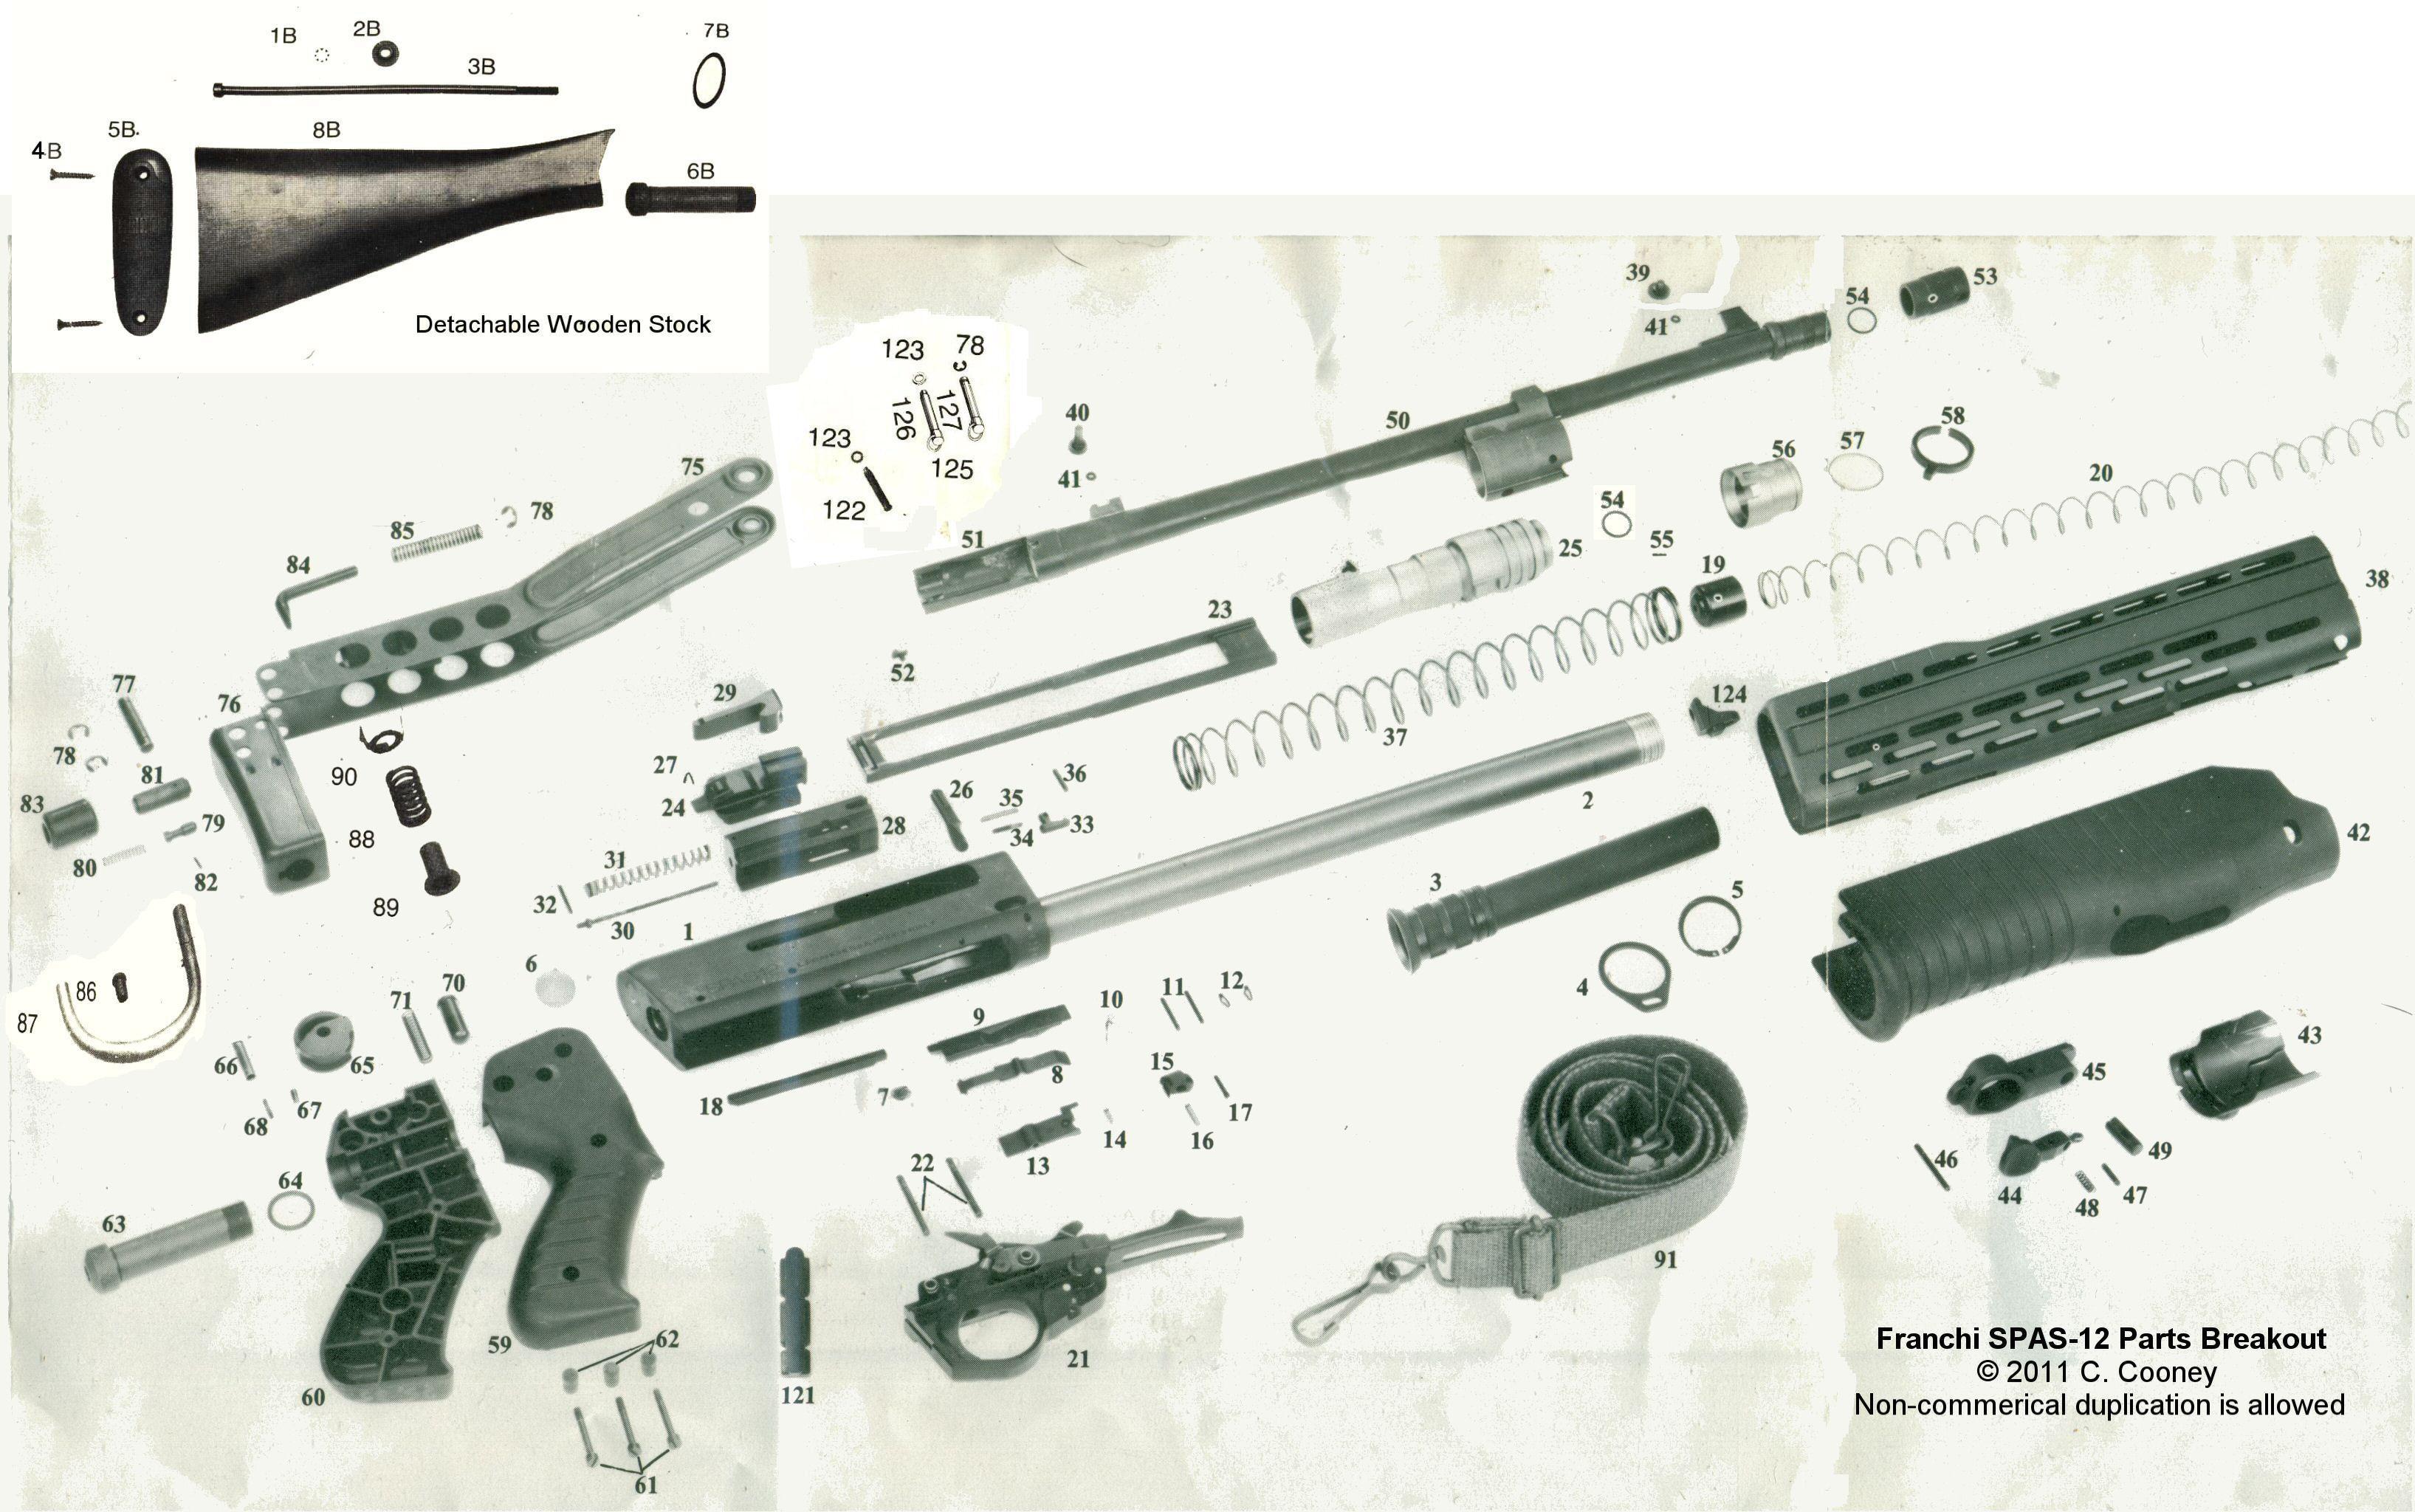 Generic Semi Auto Handgun Parts Diagram Ceiling Light Switch Wiring Exploded Gun Diagrams Google Search Armory Pinterest